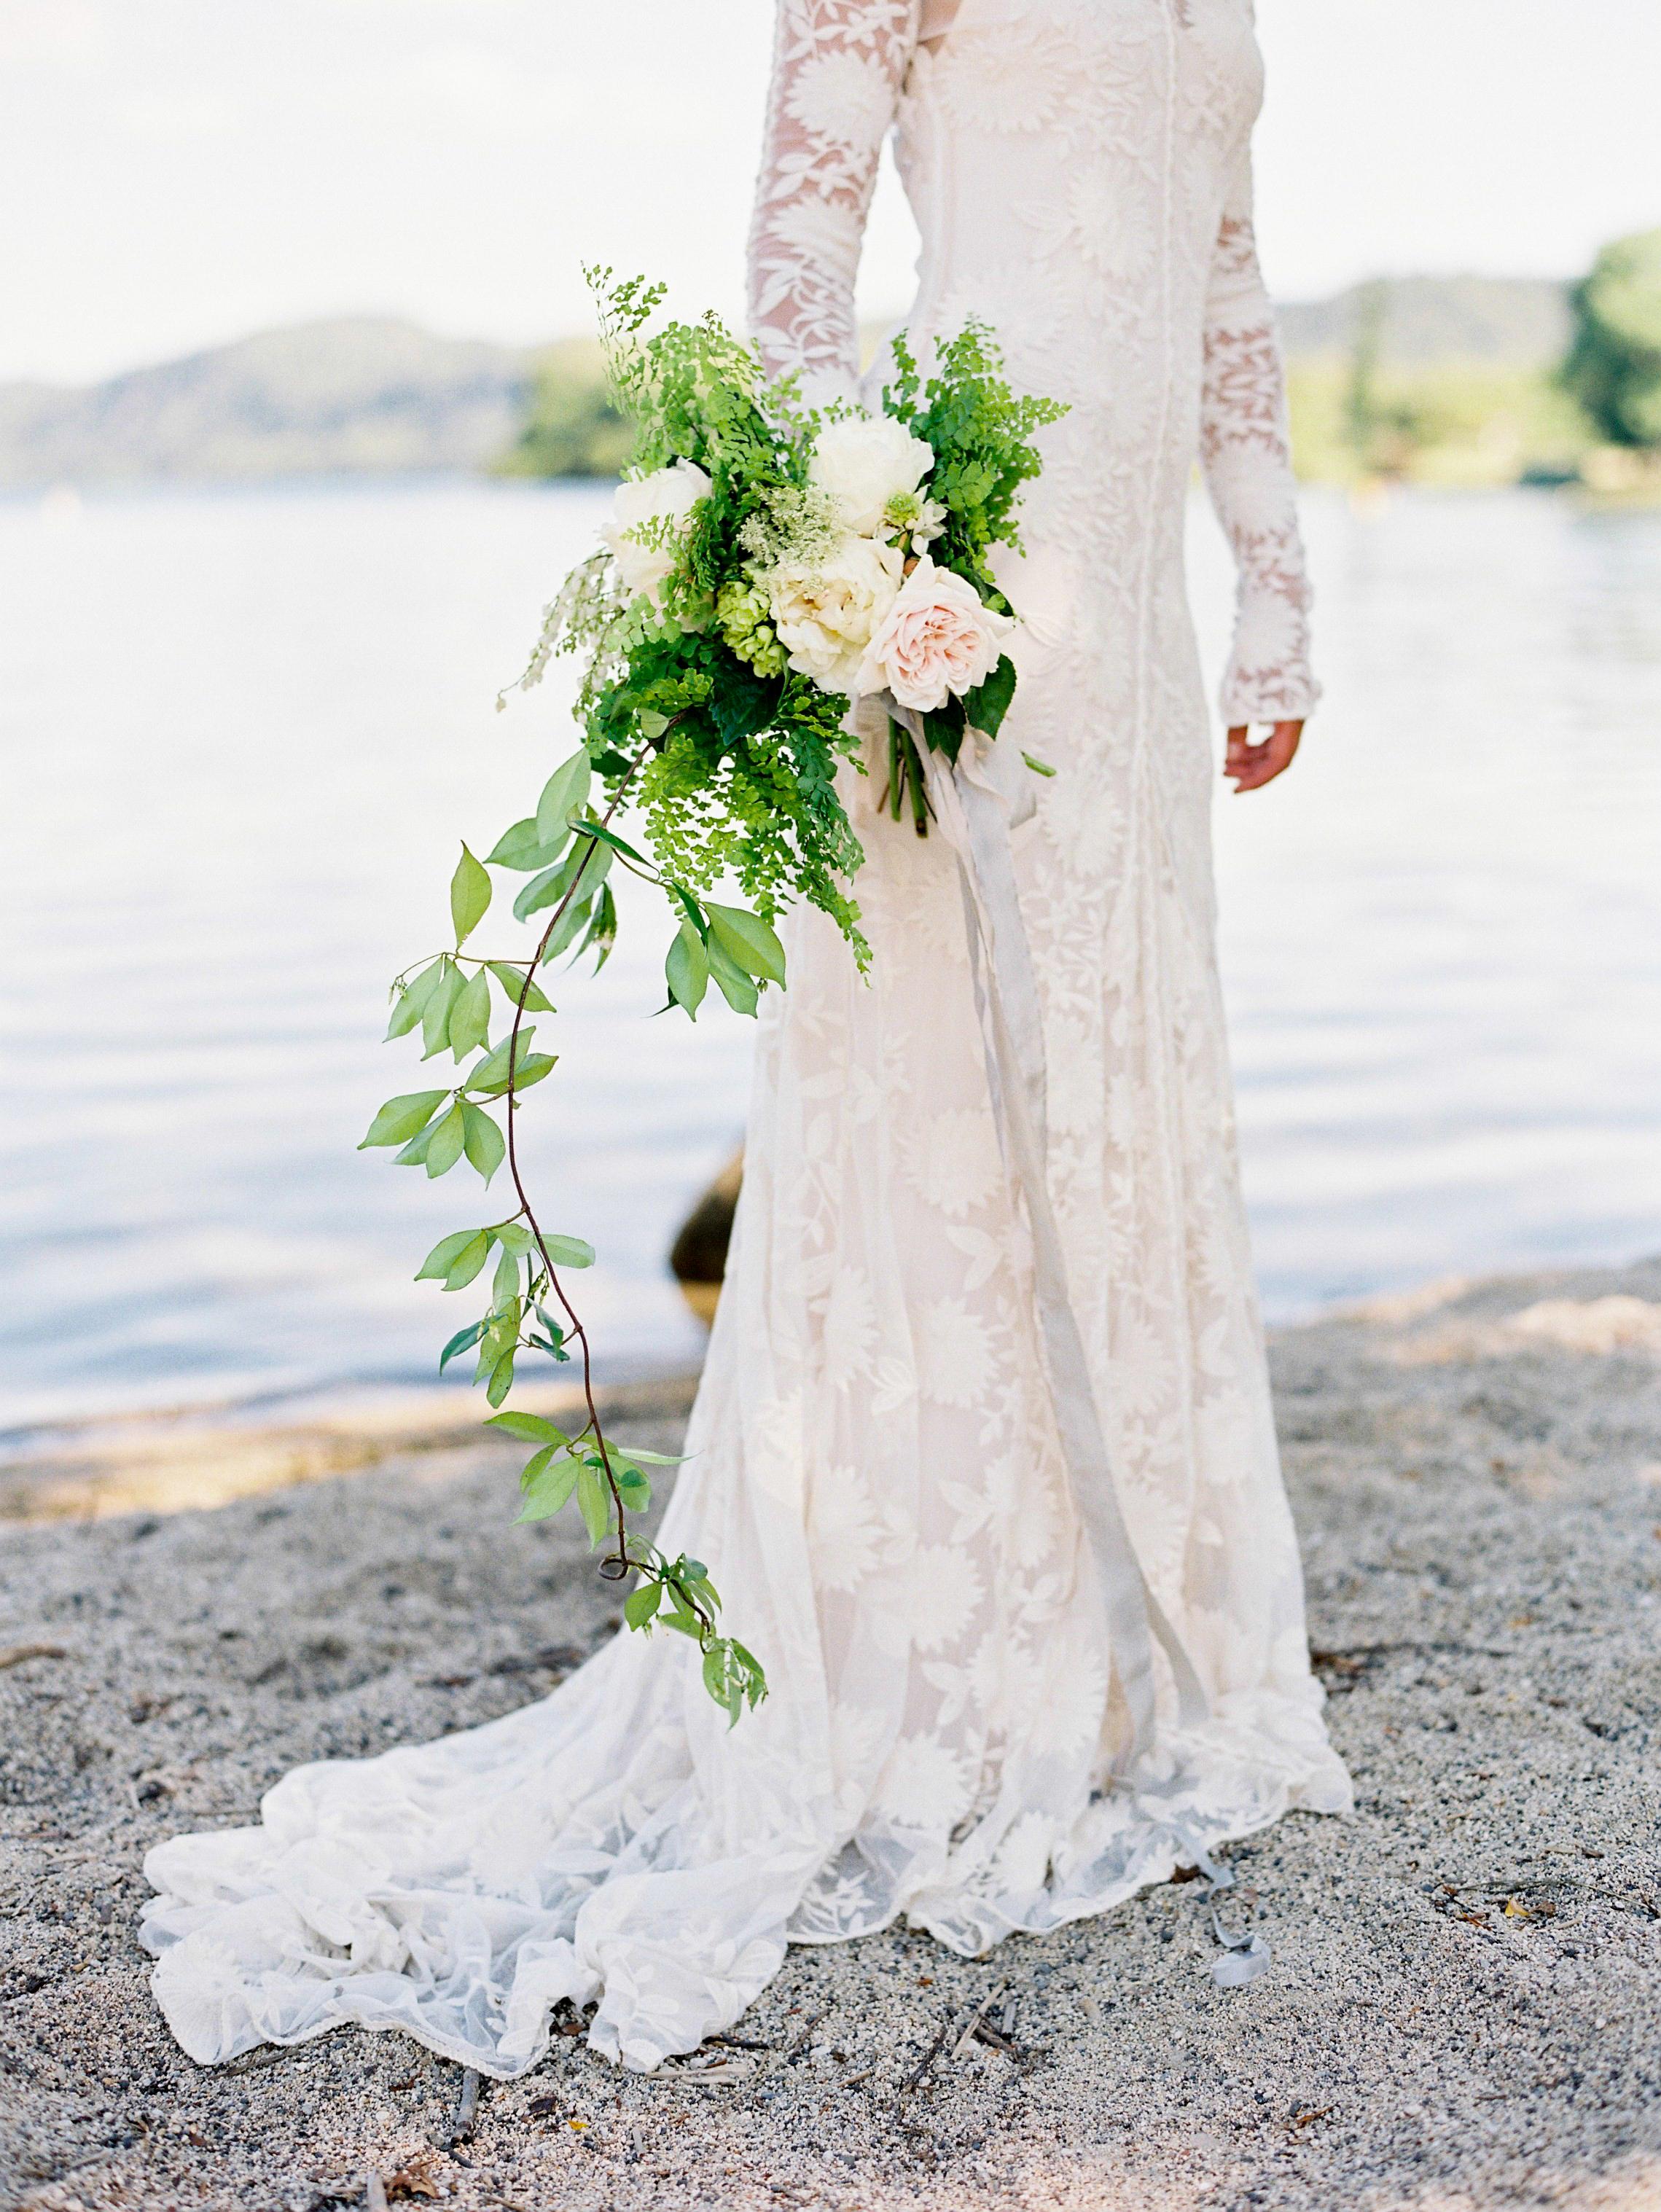 Trailing Fern Wedding Bouquet with Garden Roses